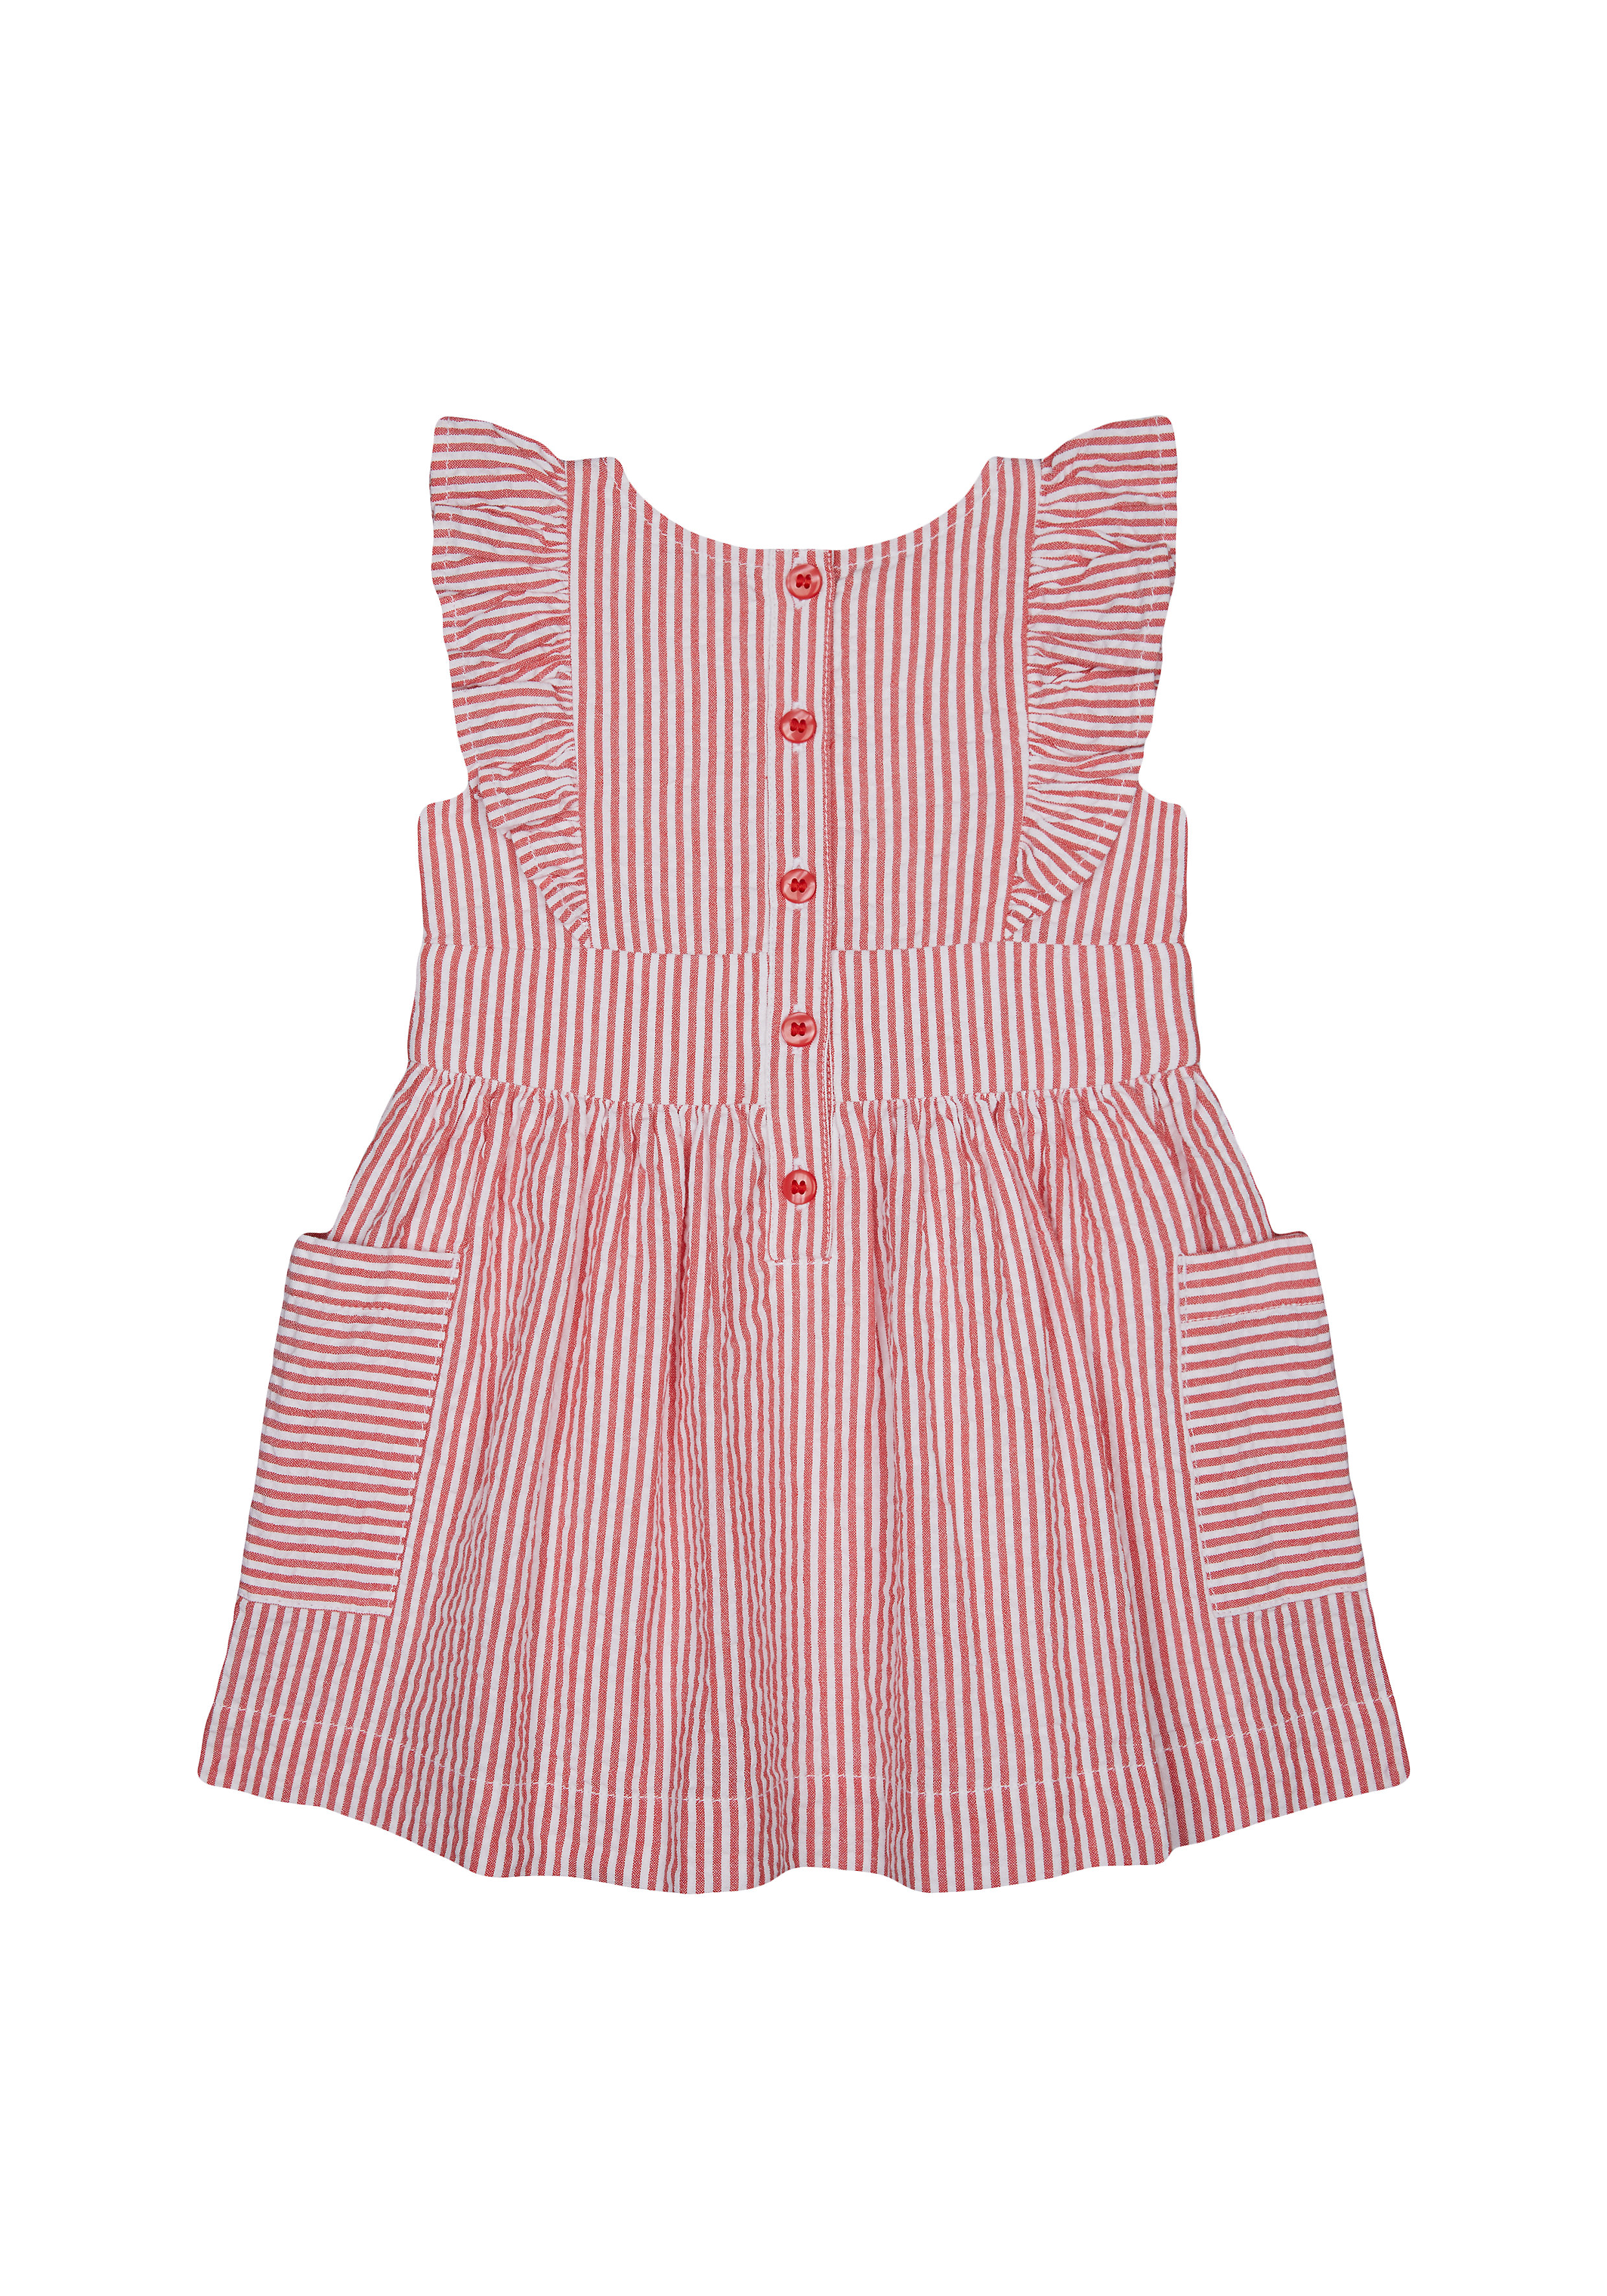 Mothercare | Girls Red Striped Seersucker Dress - Multicolor